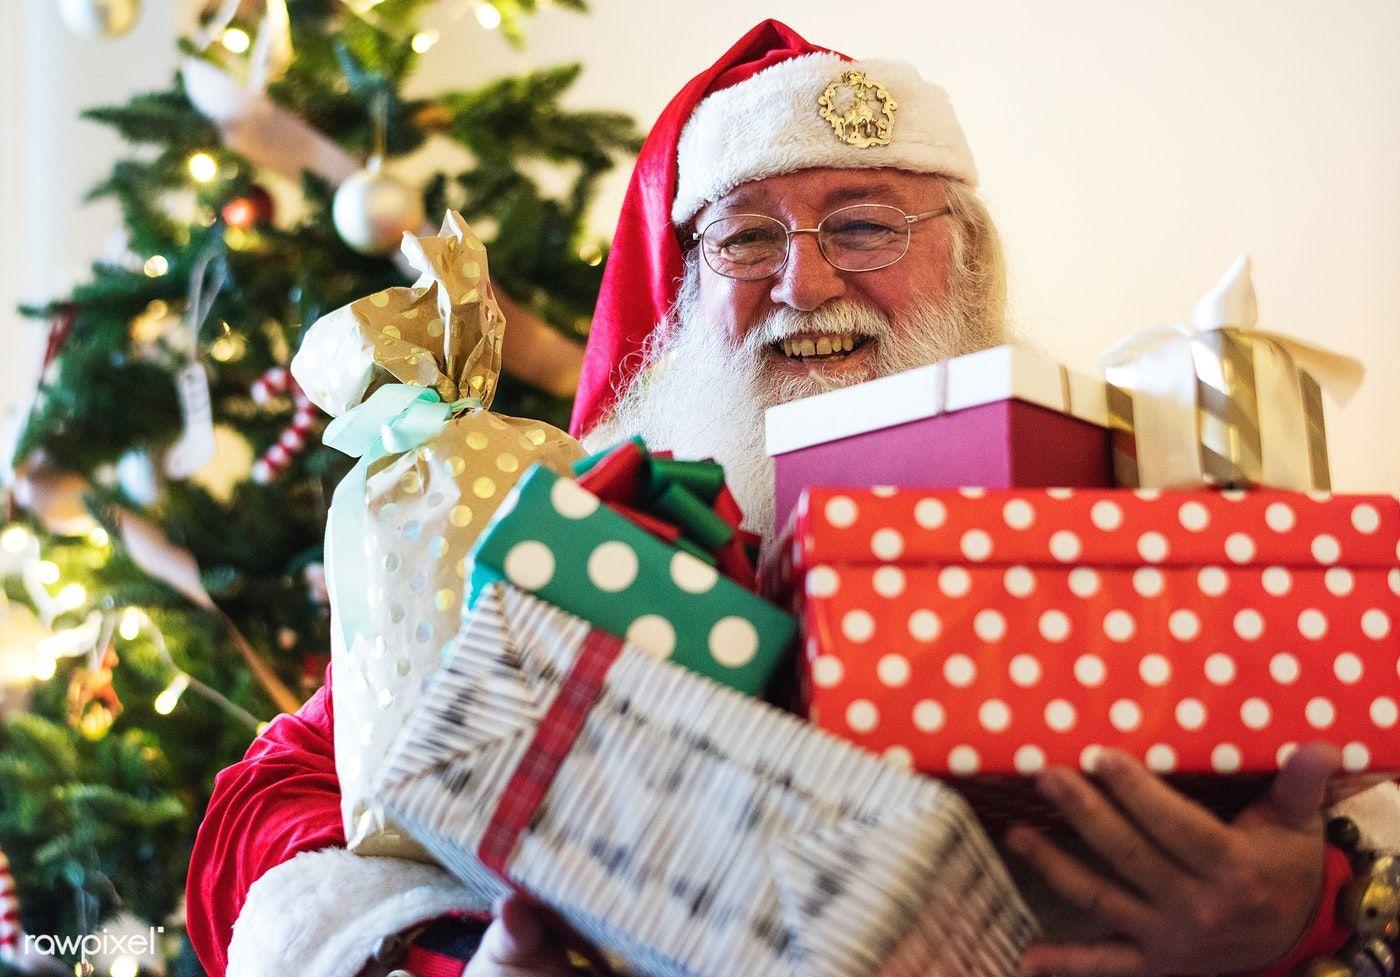 Download Premium Image Of Santa Claus Carrying A Lot Of Christmas Presents Santa Claus Images Merry Christmas Gifts Christmas Present Vector